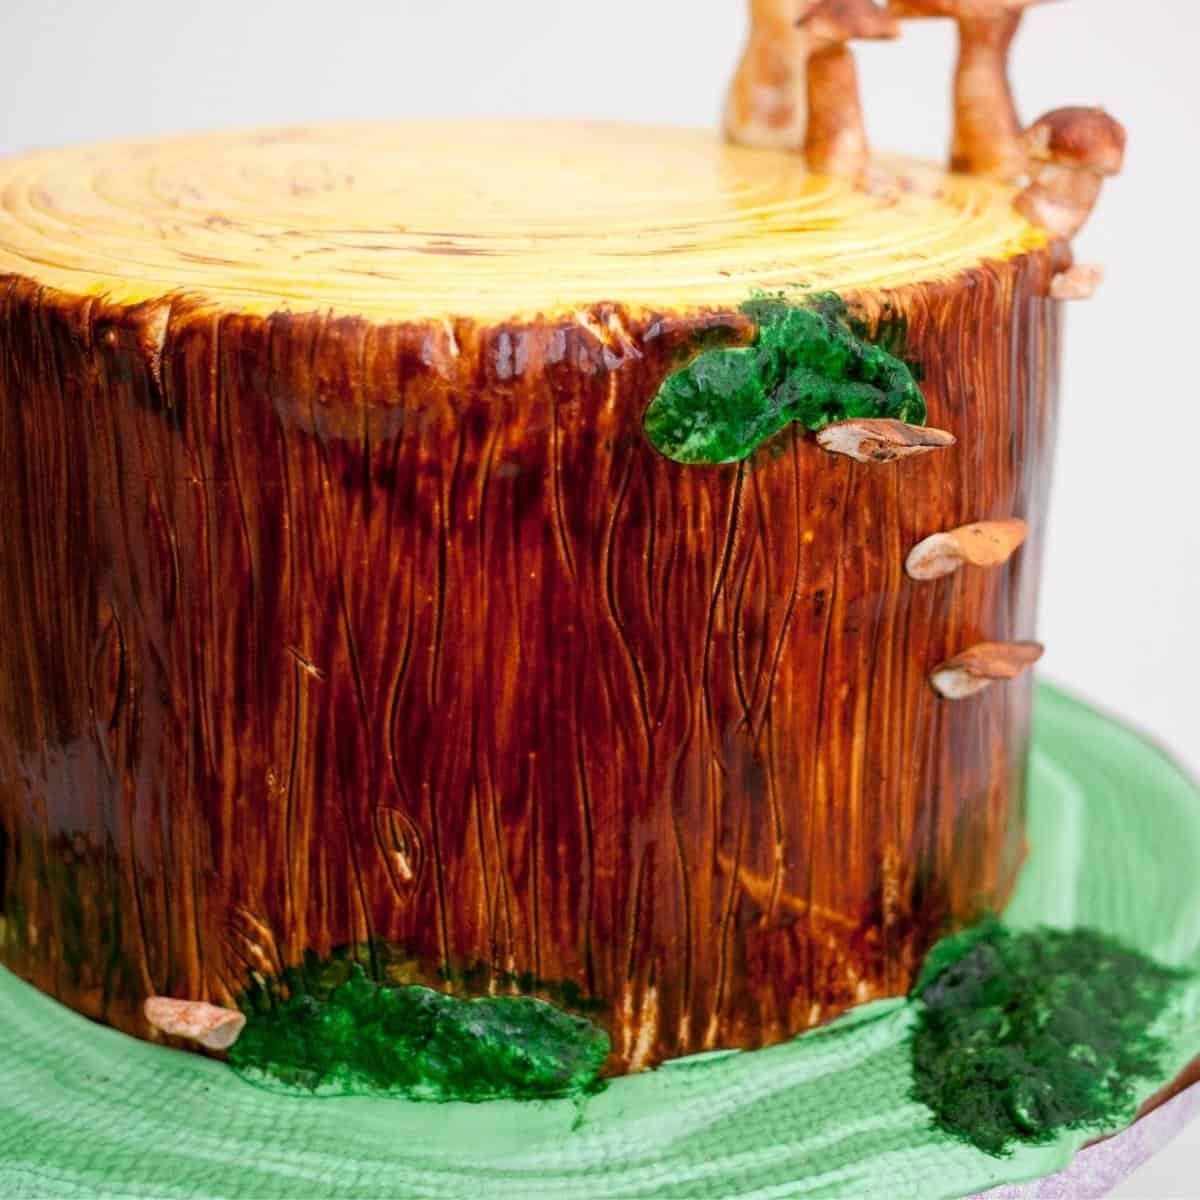 a decorated fondant tree cake